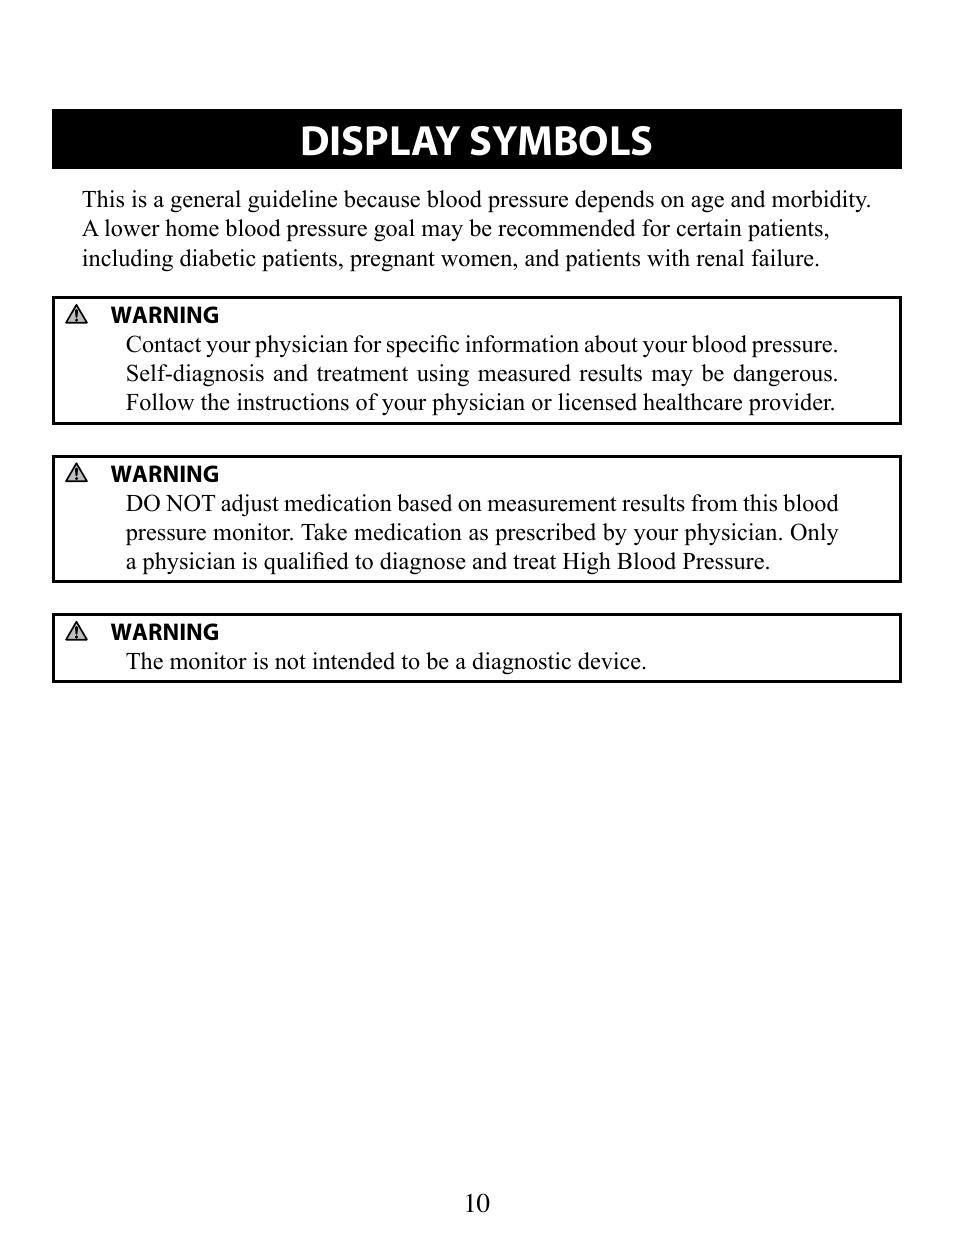 Display Symbols Omron Healthcare Bp652 User Manual Page 10 30